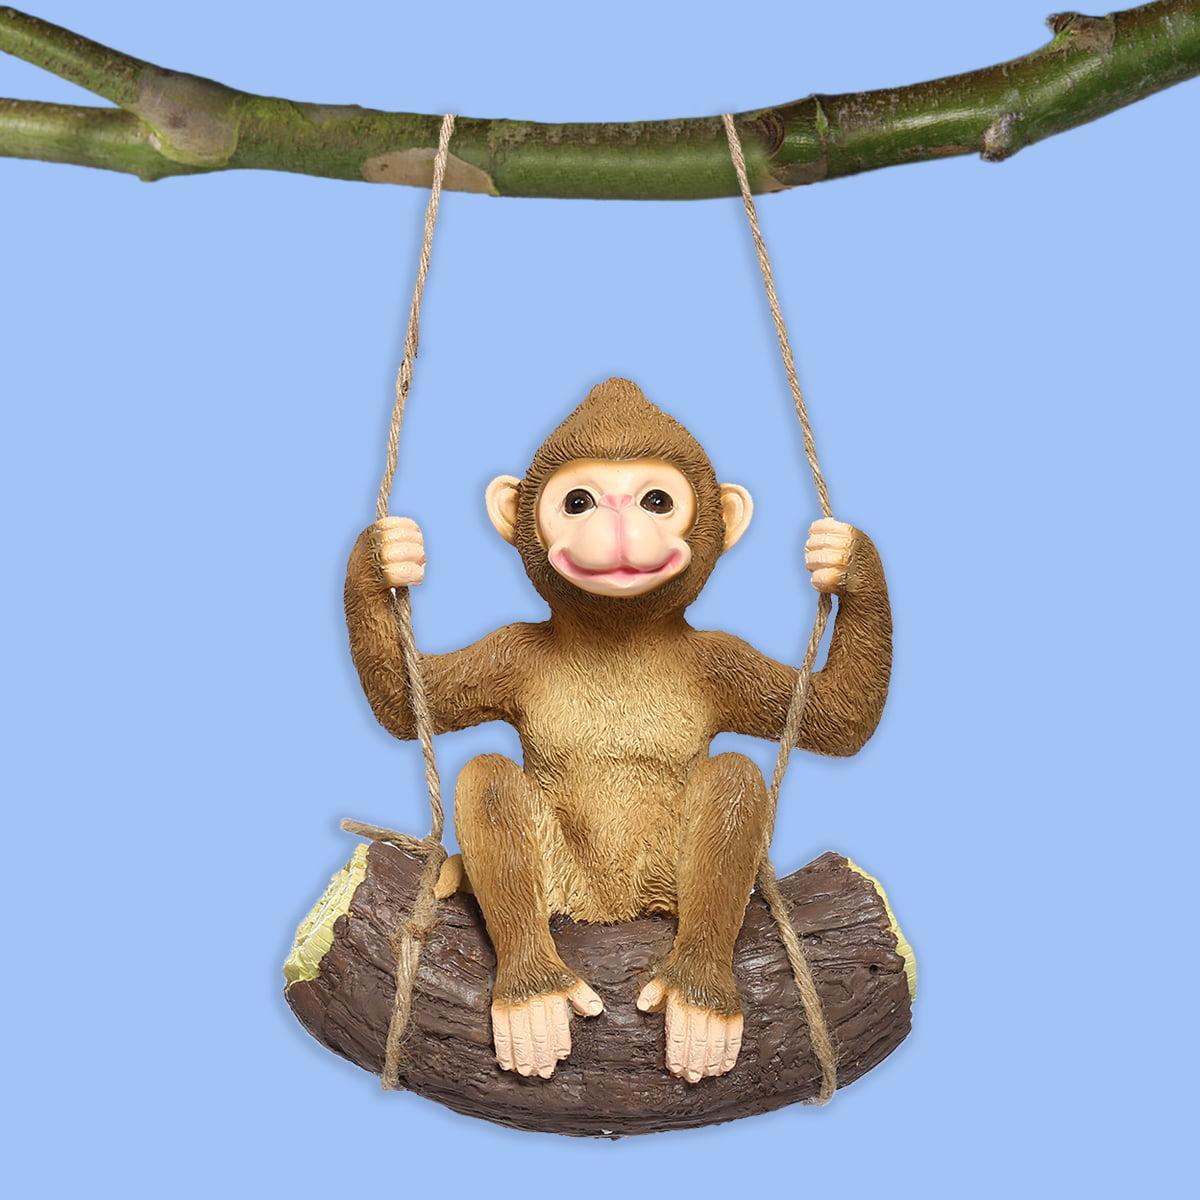 Mischievous Climbing Baby Chimp Monkey Sculpture Garden Statue